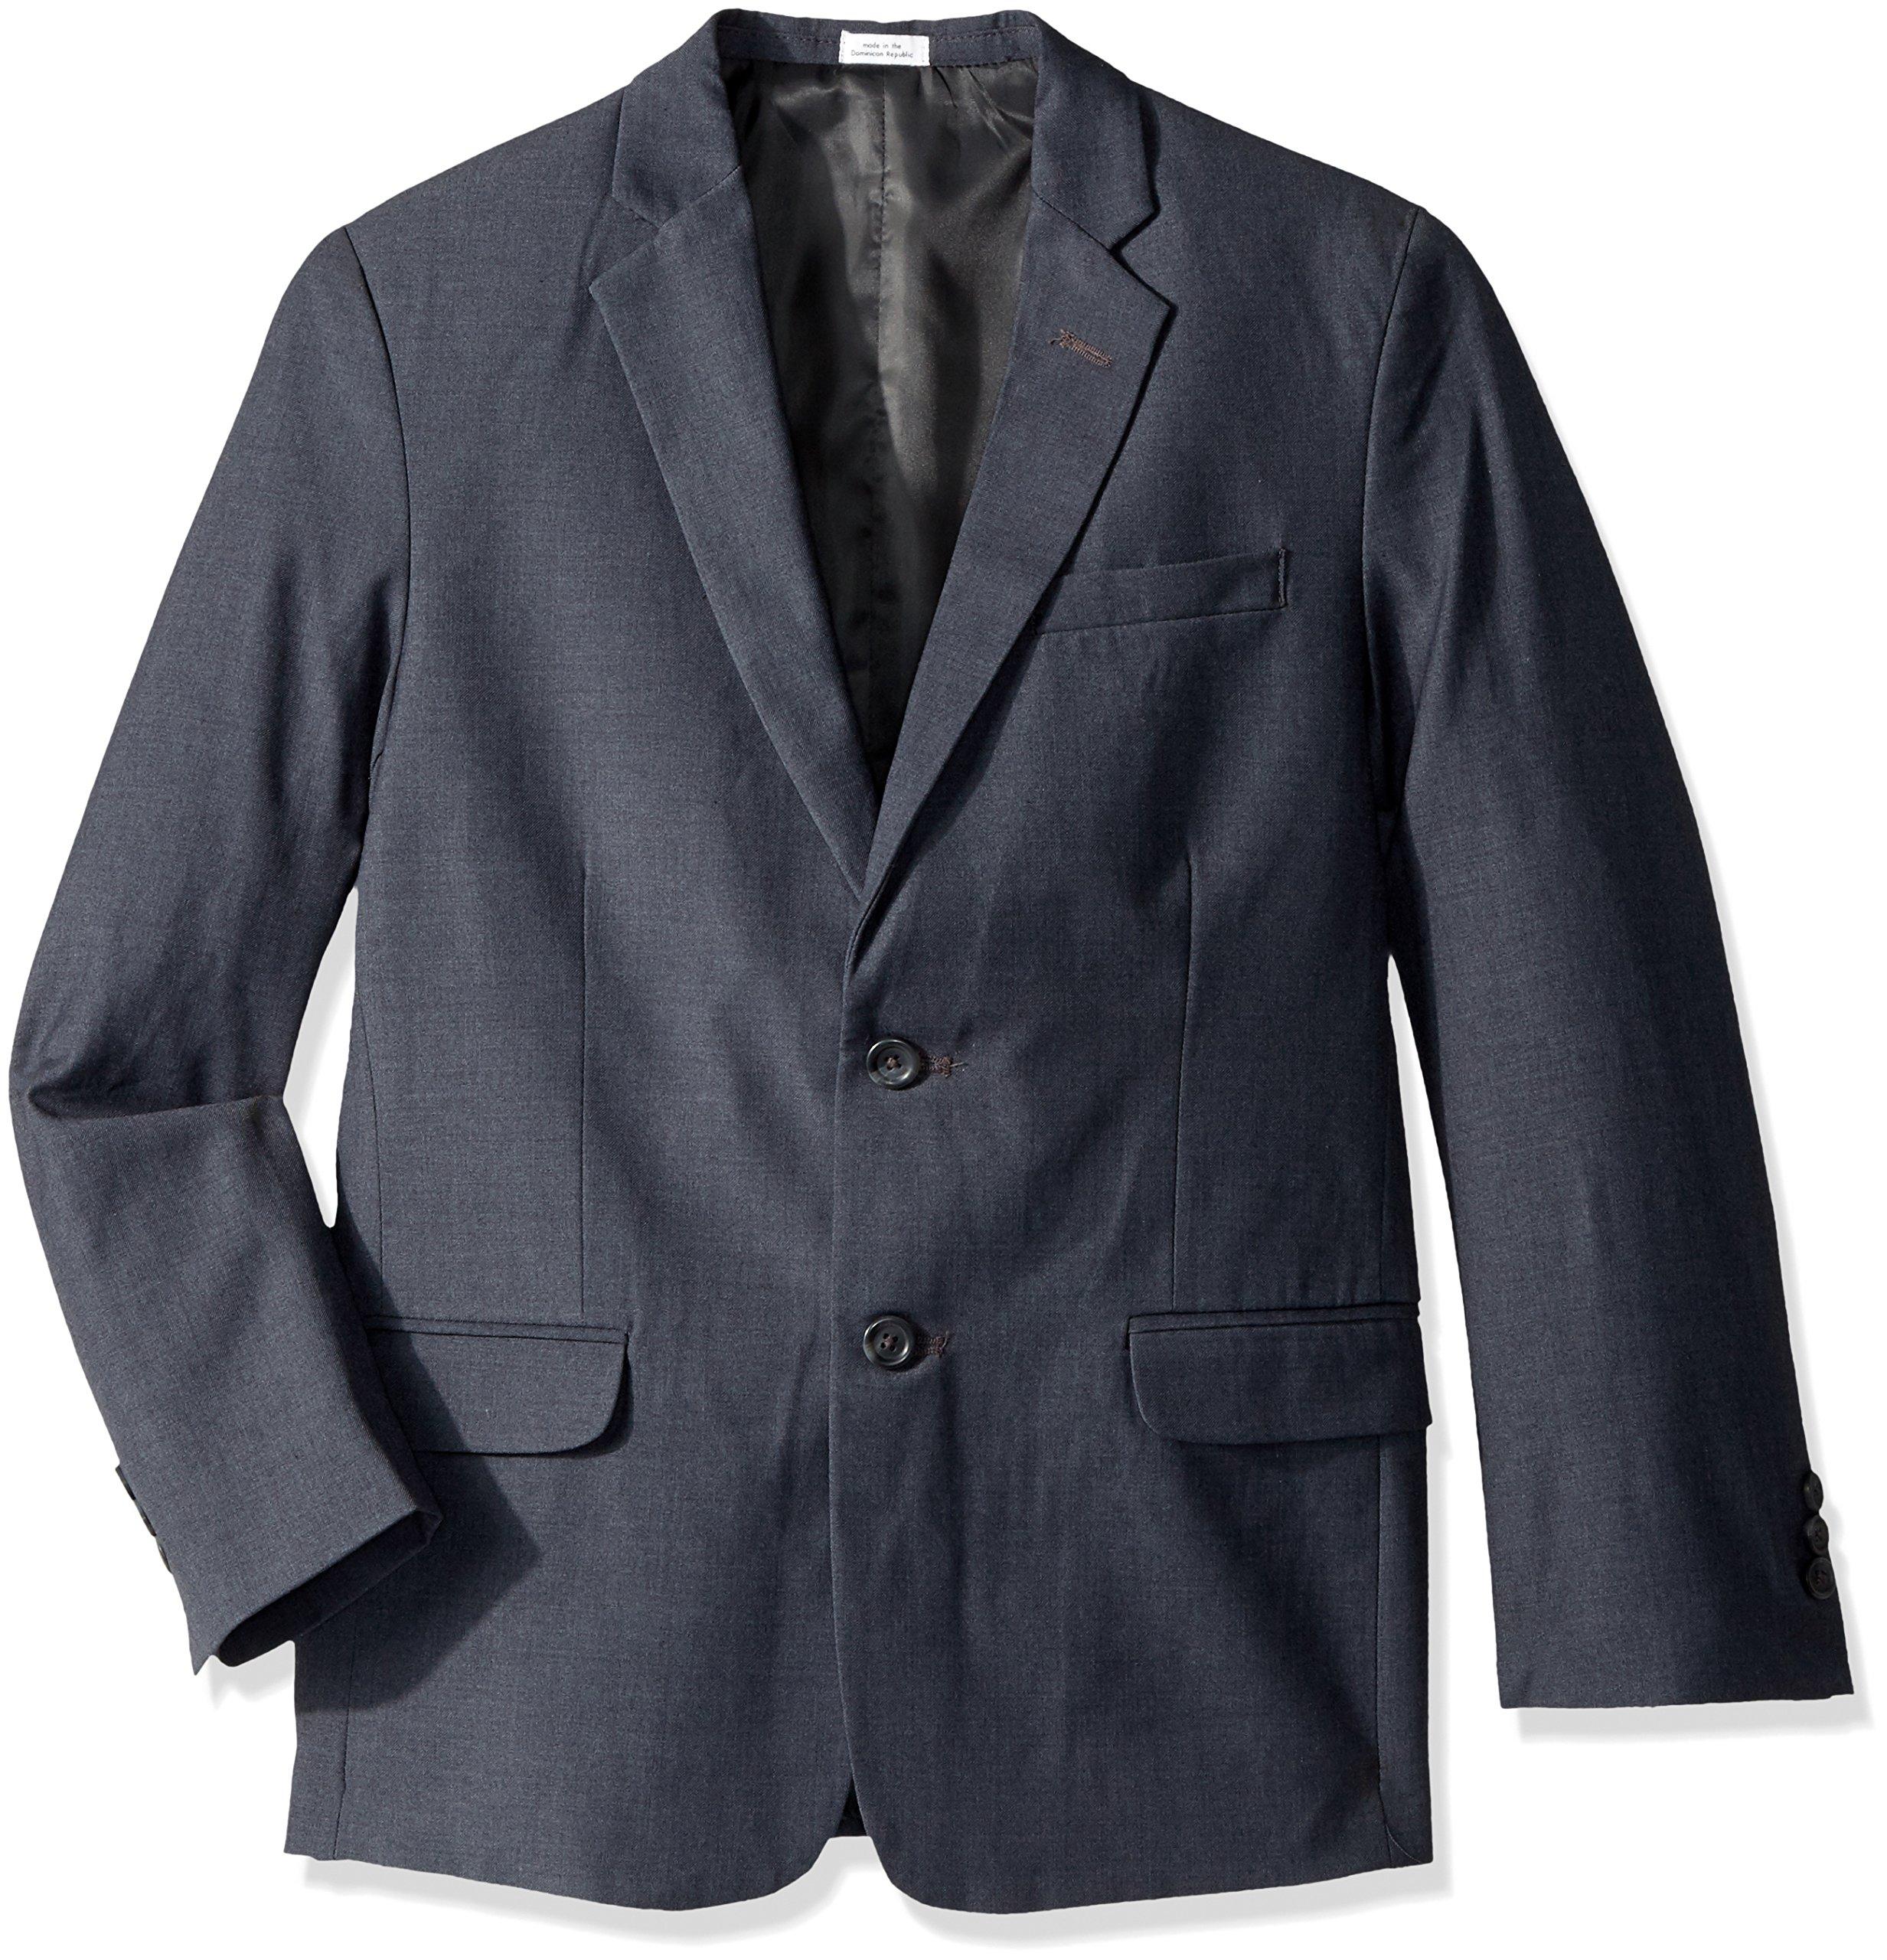 Calvin Klein Husky Boys' Blazer Jacket, Fine Line Charcoal, 14